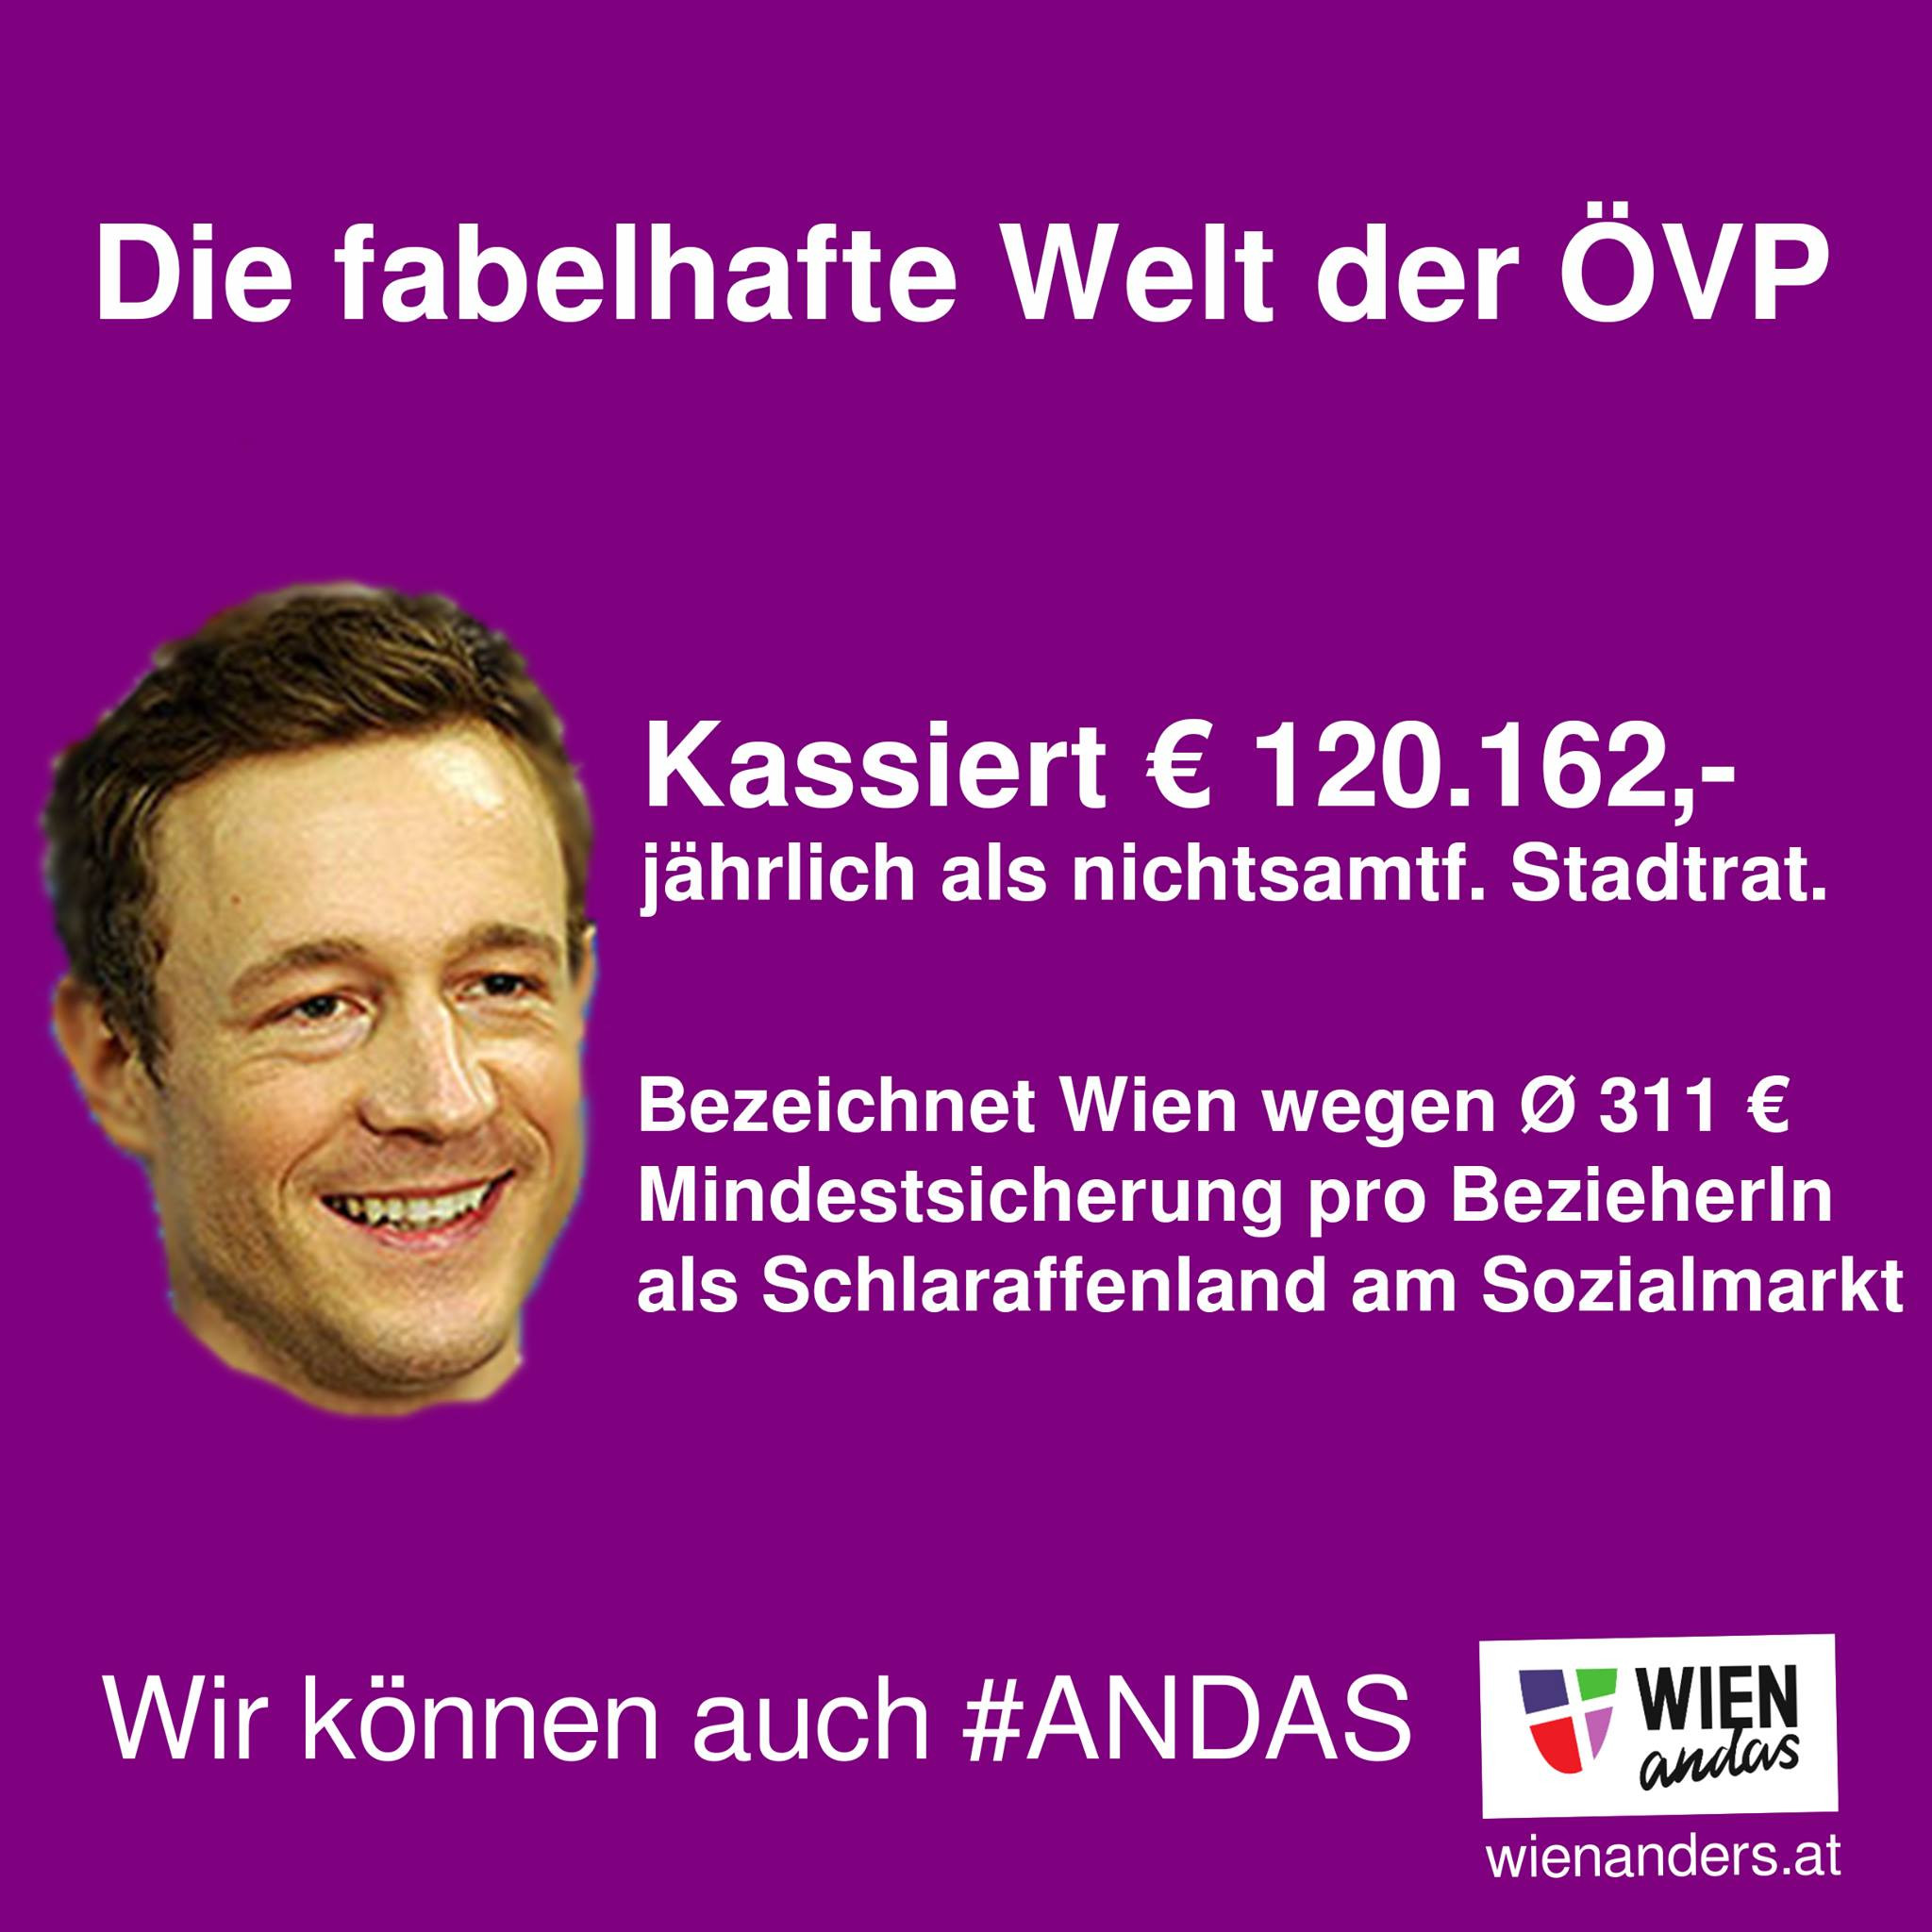 Die fabelhafte Welt der ÖVP